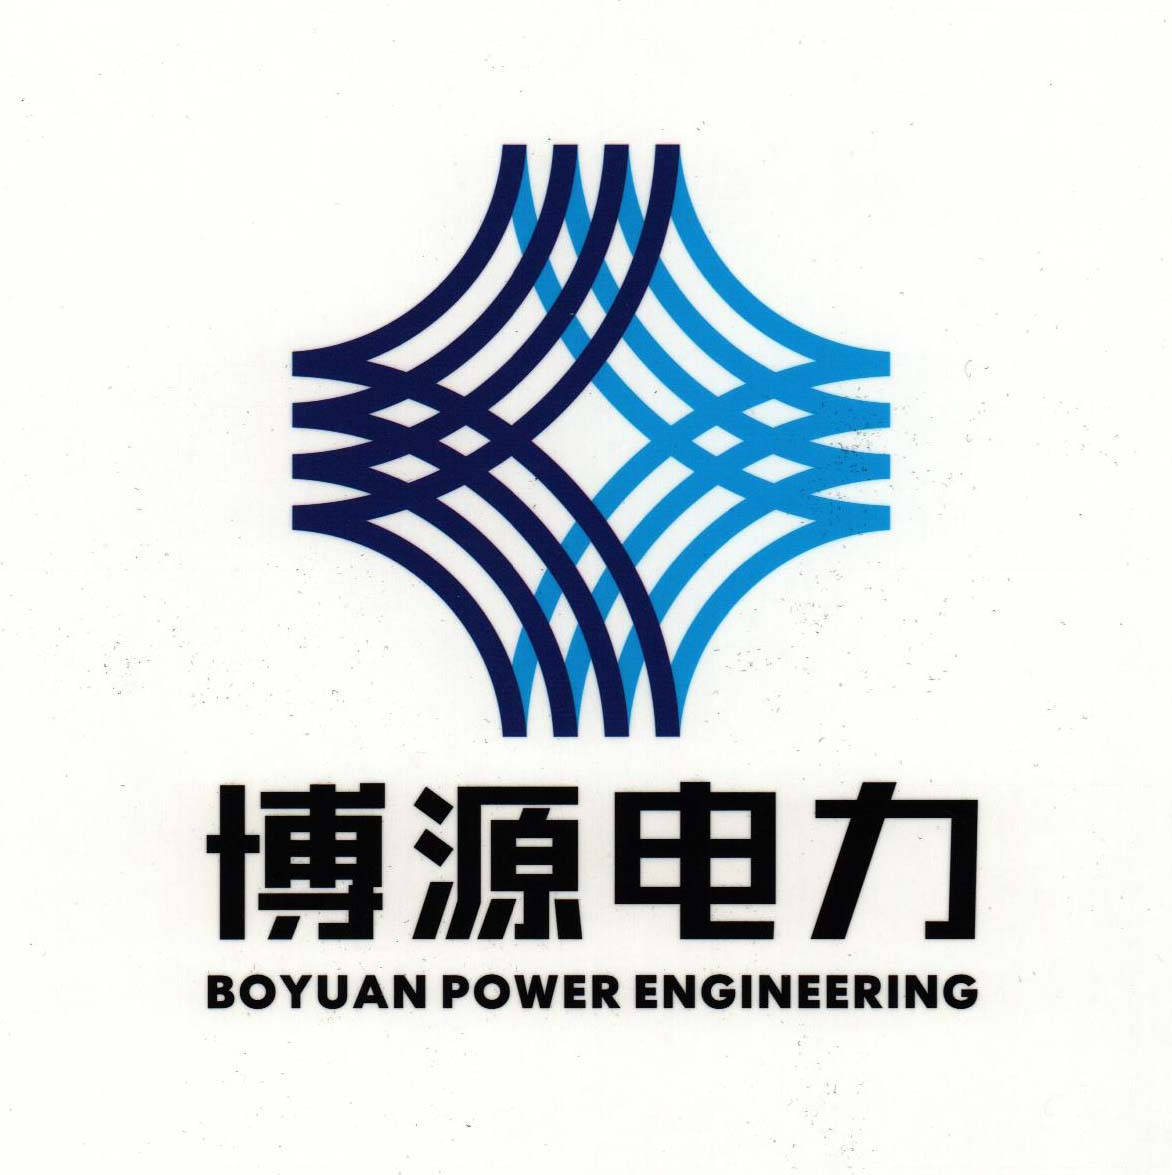 https://static.bjx.com.cn/company-logo/2018/08/31/2018083116170814_img593434.jpg?x-oss-process=image/resize,w_130,h_130